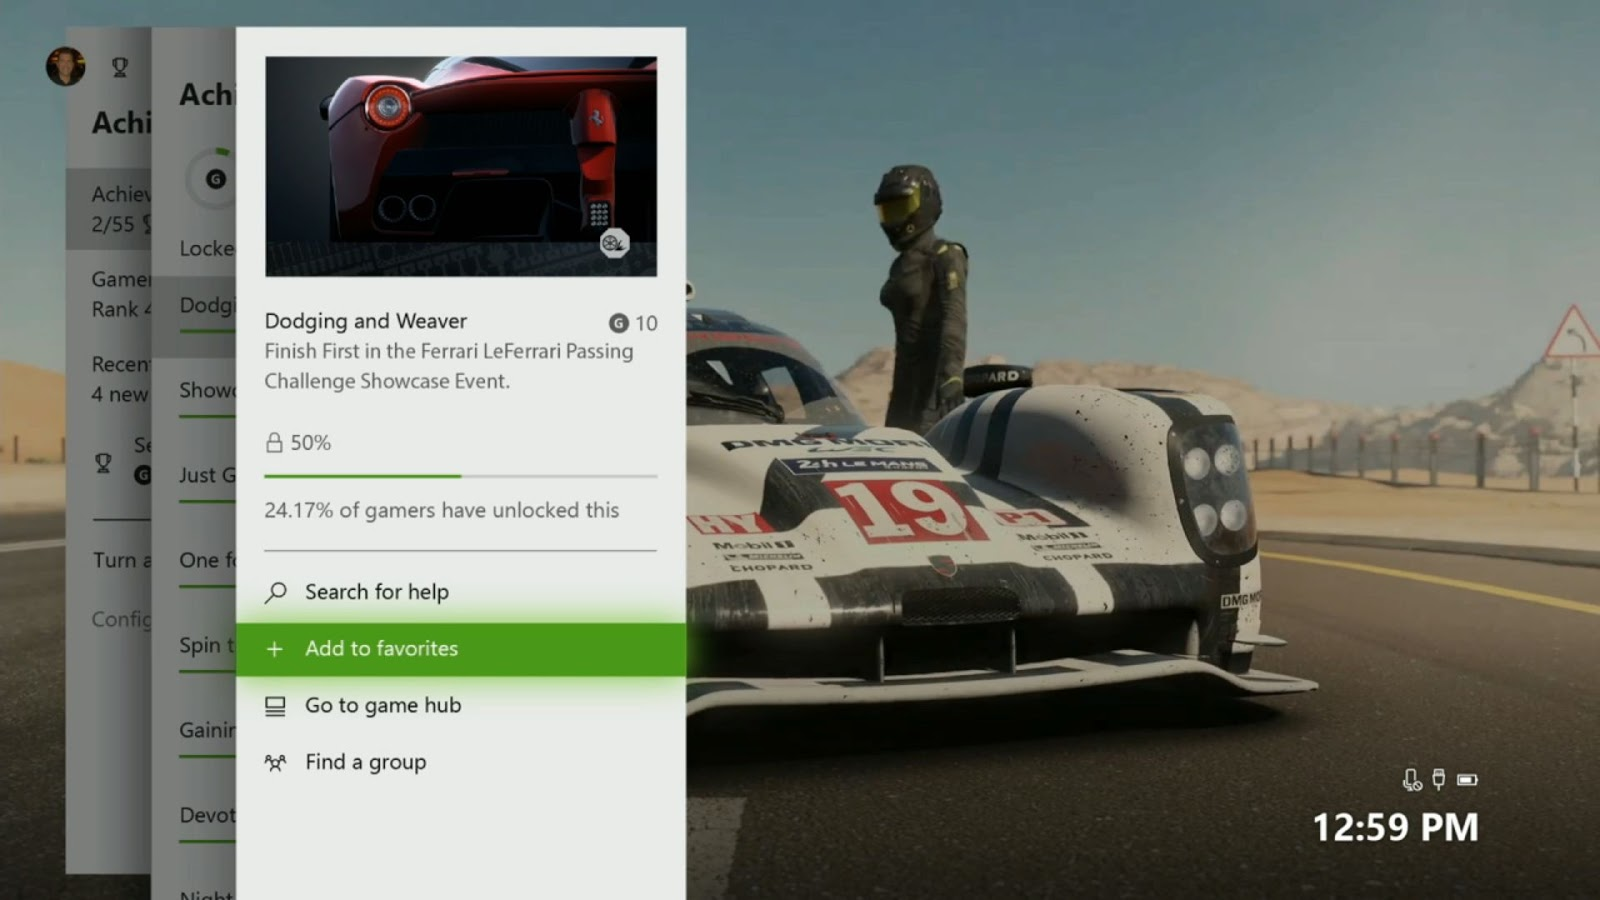 XboxOneUI-10.jpg